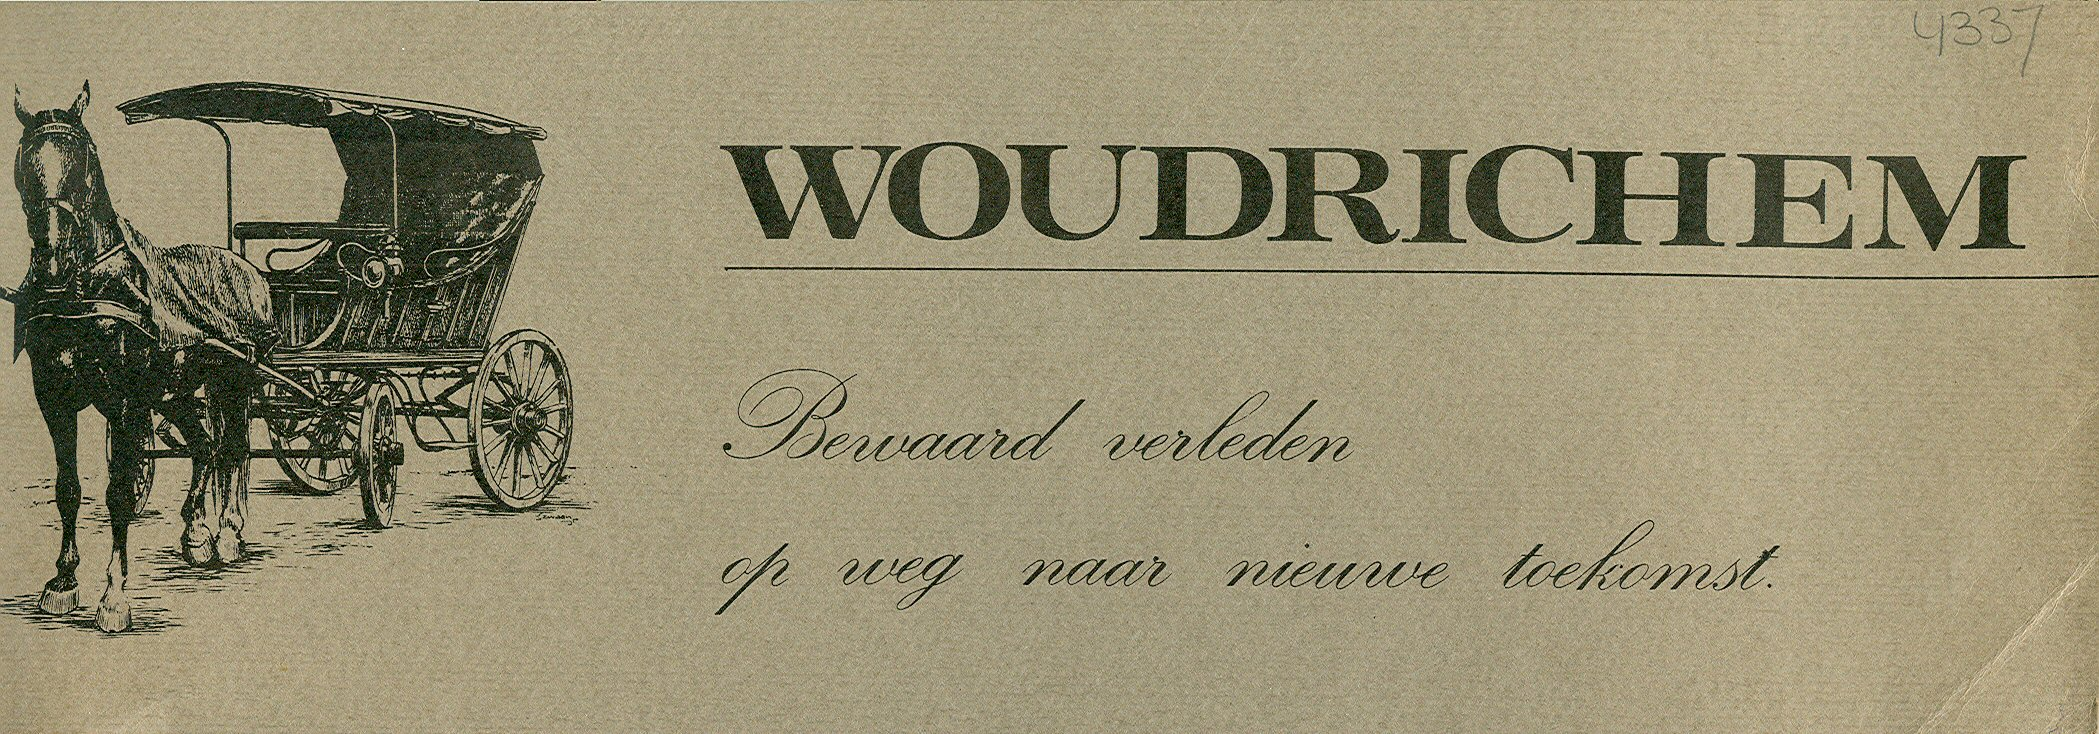 014 Woudrichem a